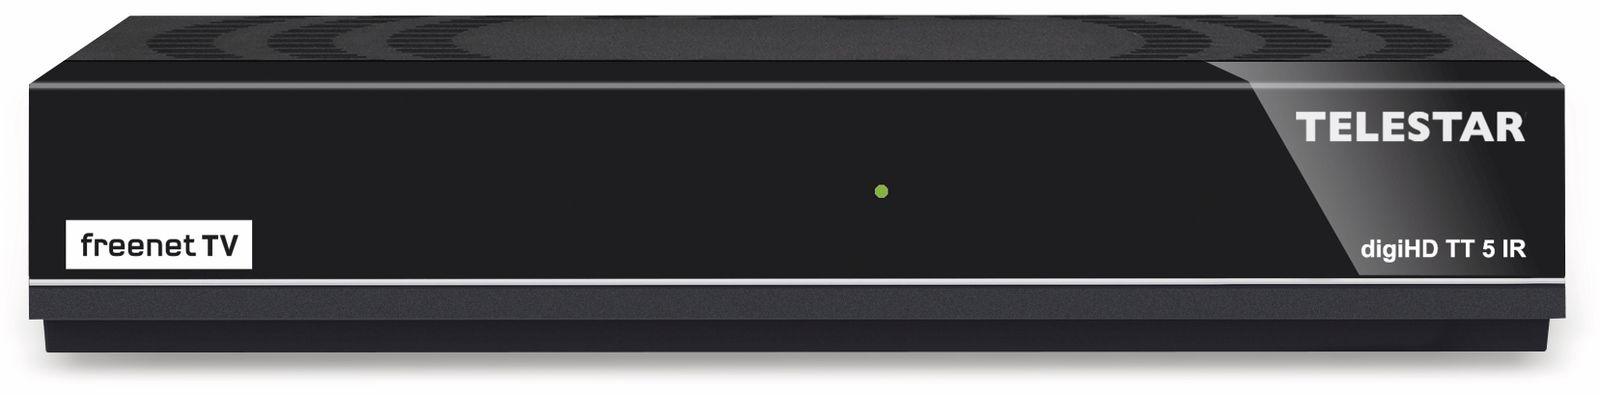 dvb t2 hdtv receiver telestar digihd tt5 ir freenet tv online kaufen. Black Bedroom Furniture Sets. Home Design Ideas